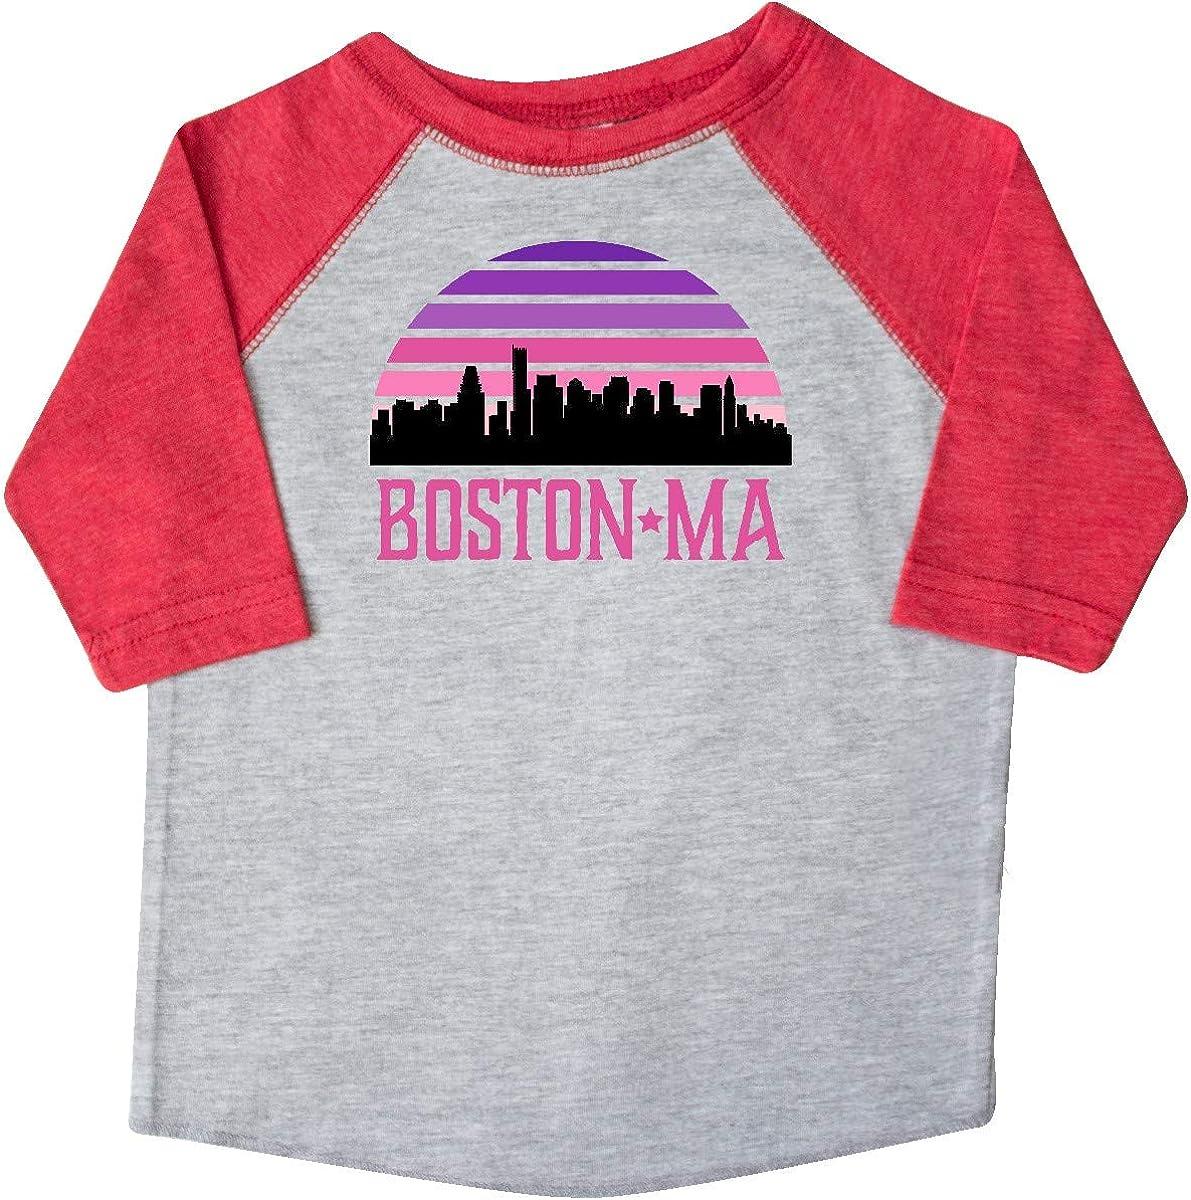 inktastic Boston Gifts for Kids Retro Skyline Toddler T-Shirt